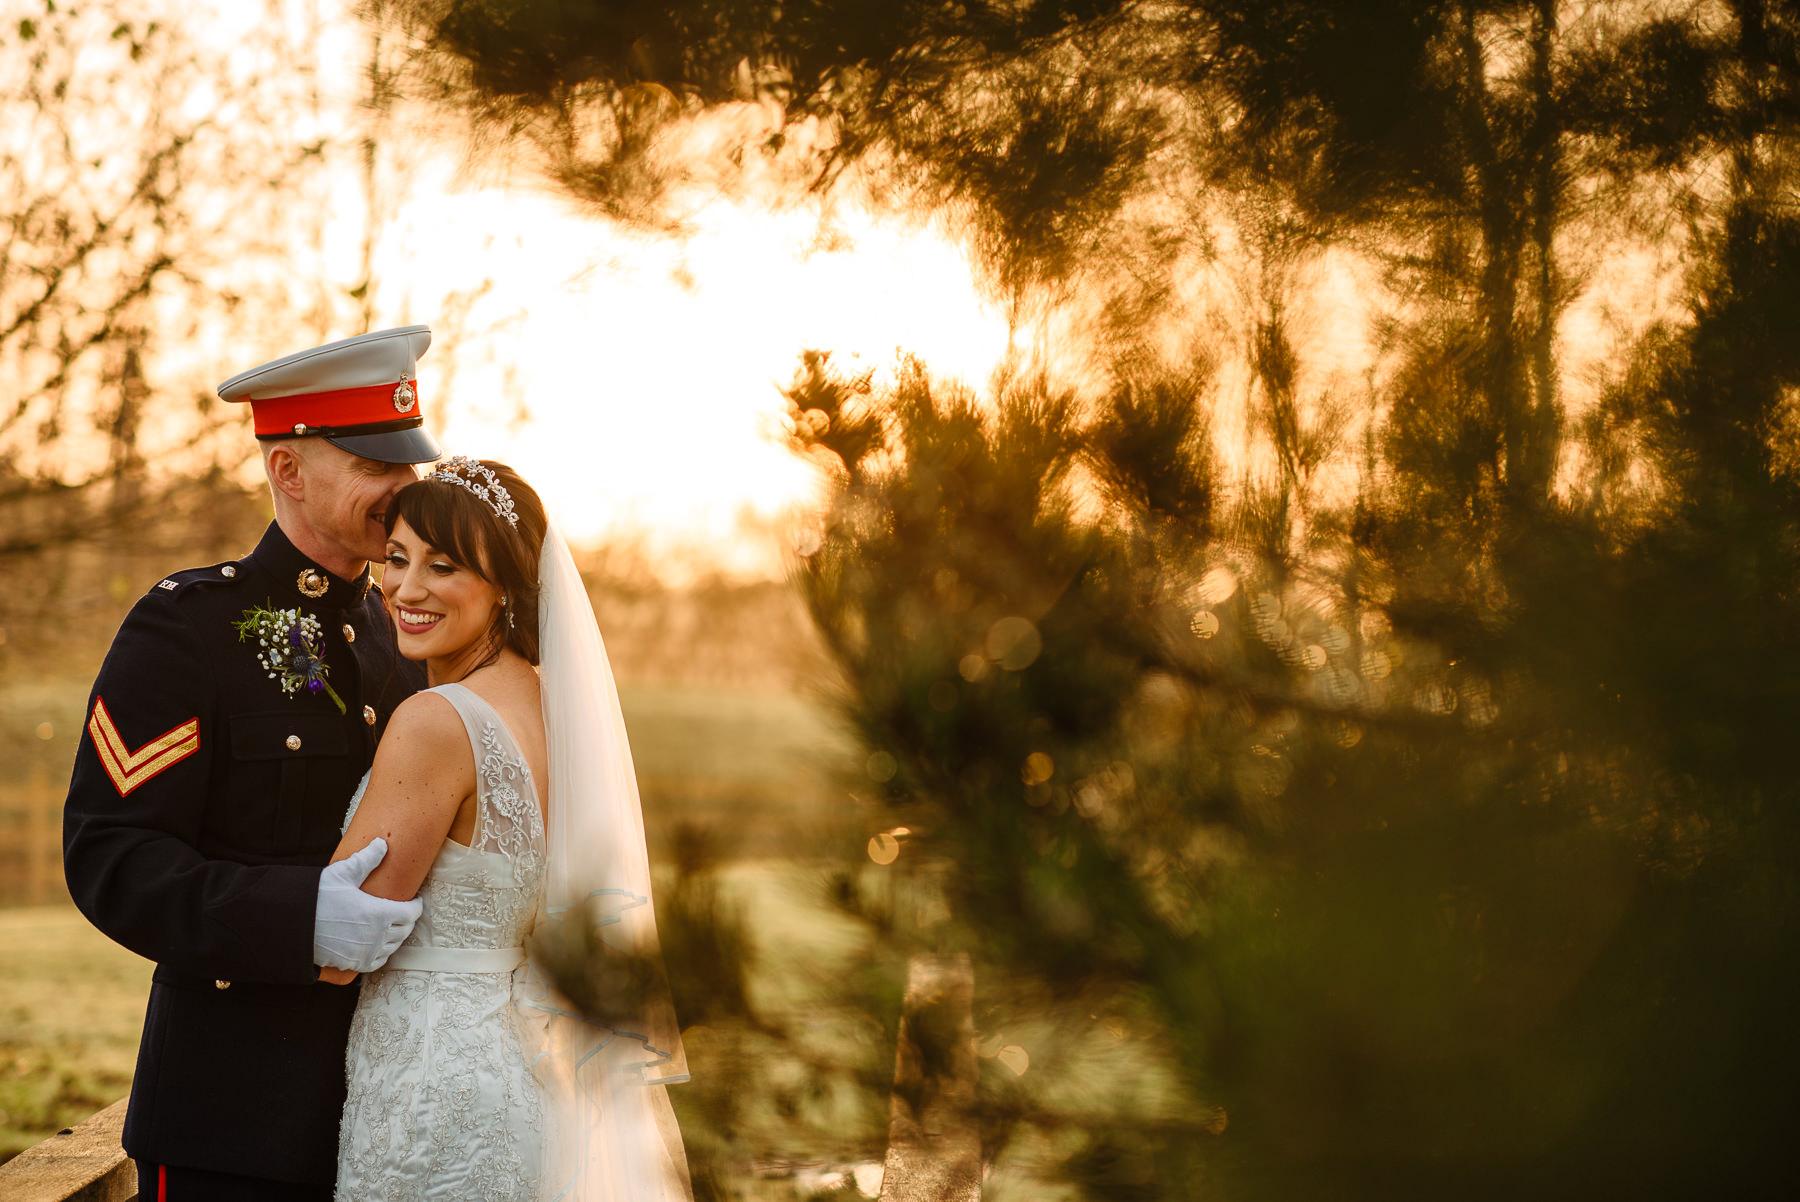 Military groom cuddling his bride at Charnock Farm near Leyland at sunset